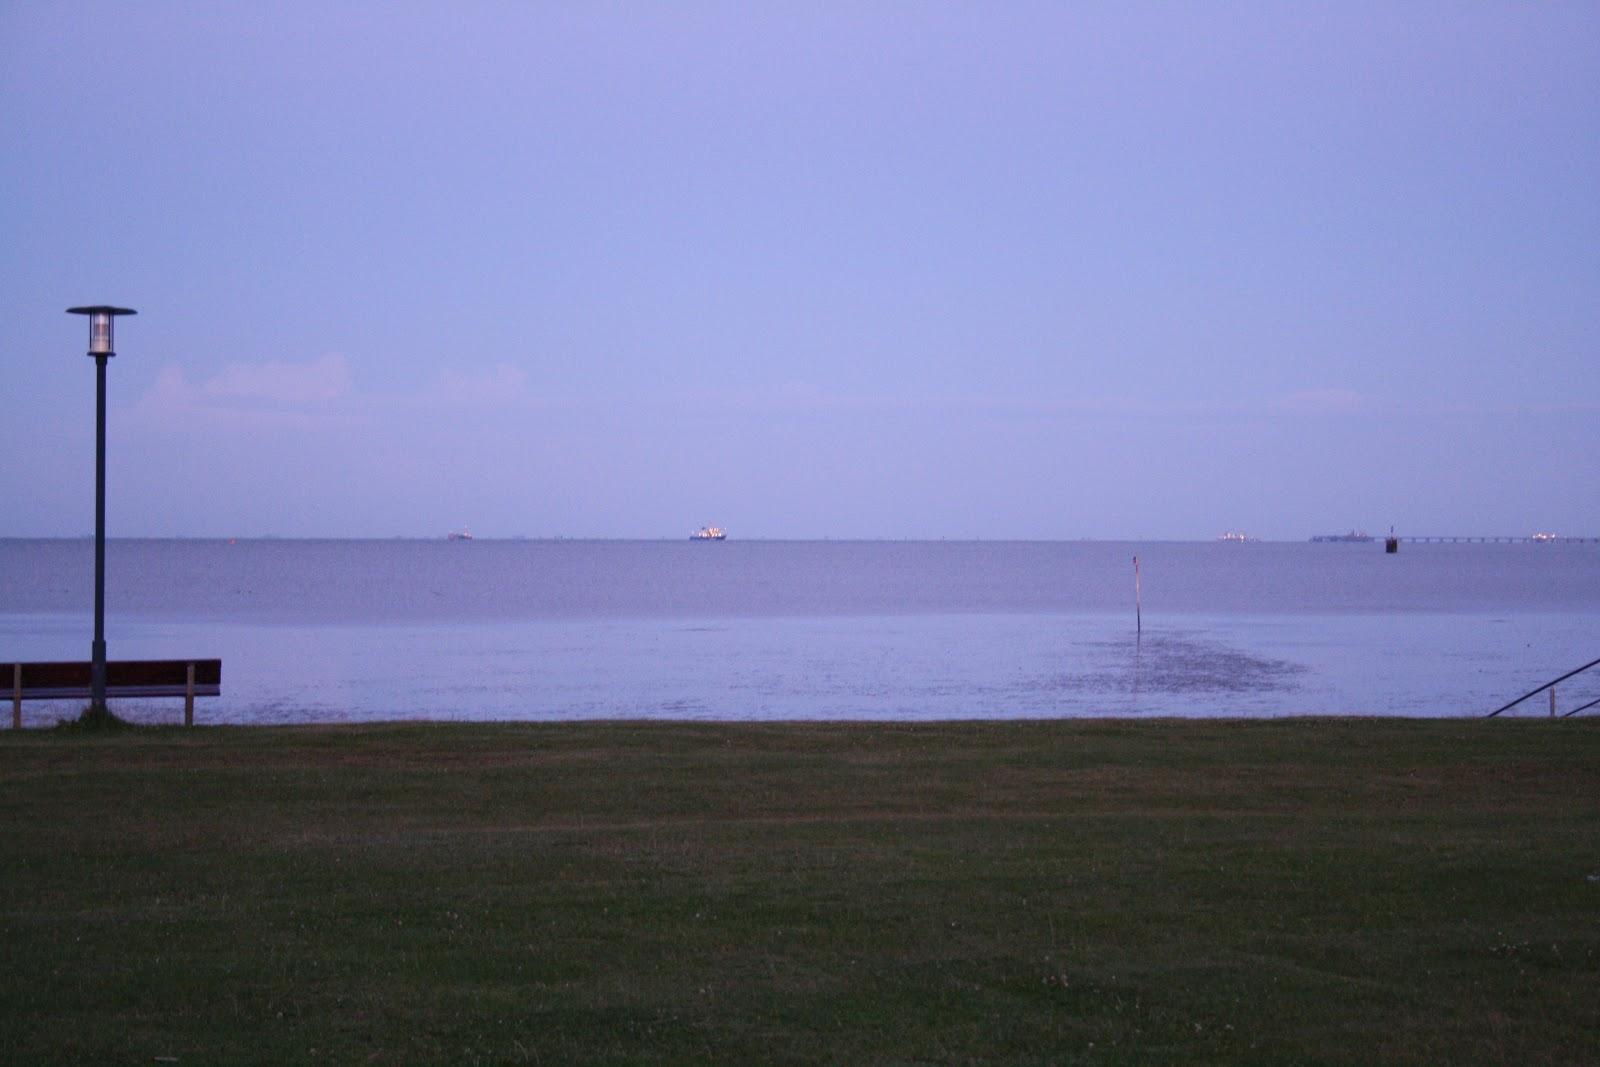 Blackfairys Welt Wochenende An Der Nordsee